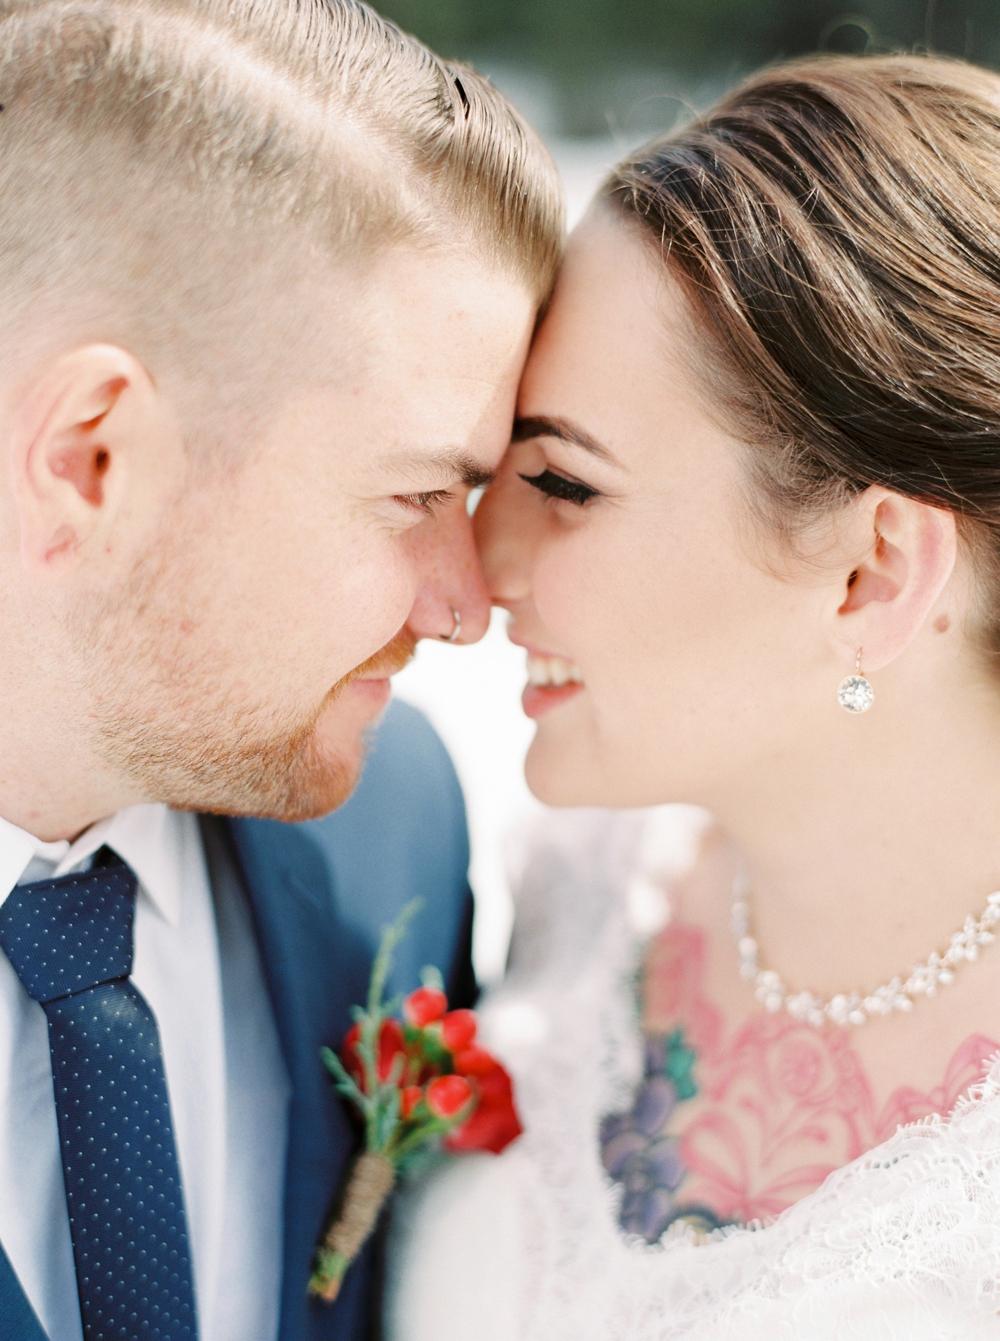 Emerald Lake Lodge Field British Columbia Elopement Photographers | Fine art film destination wedding photography | winter wedding